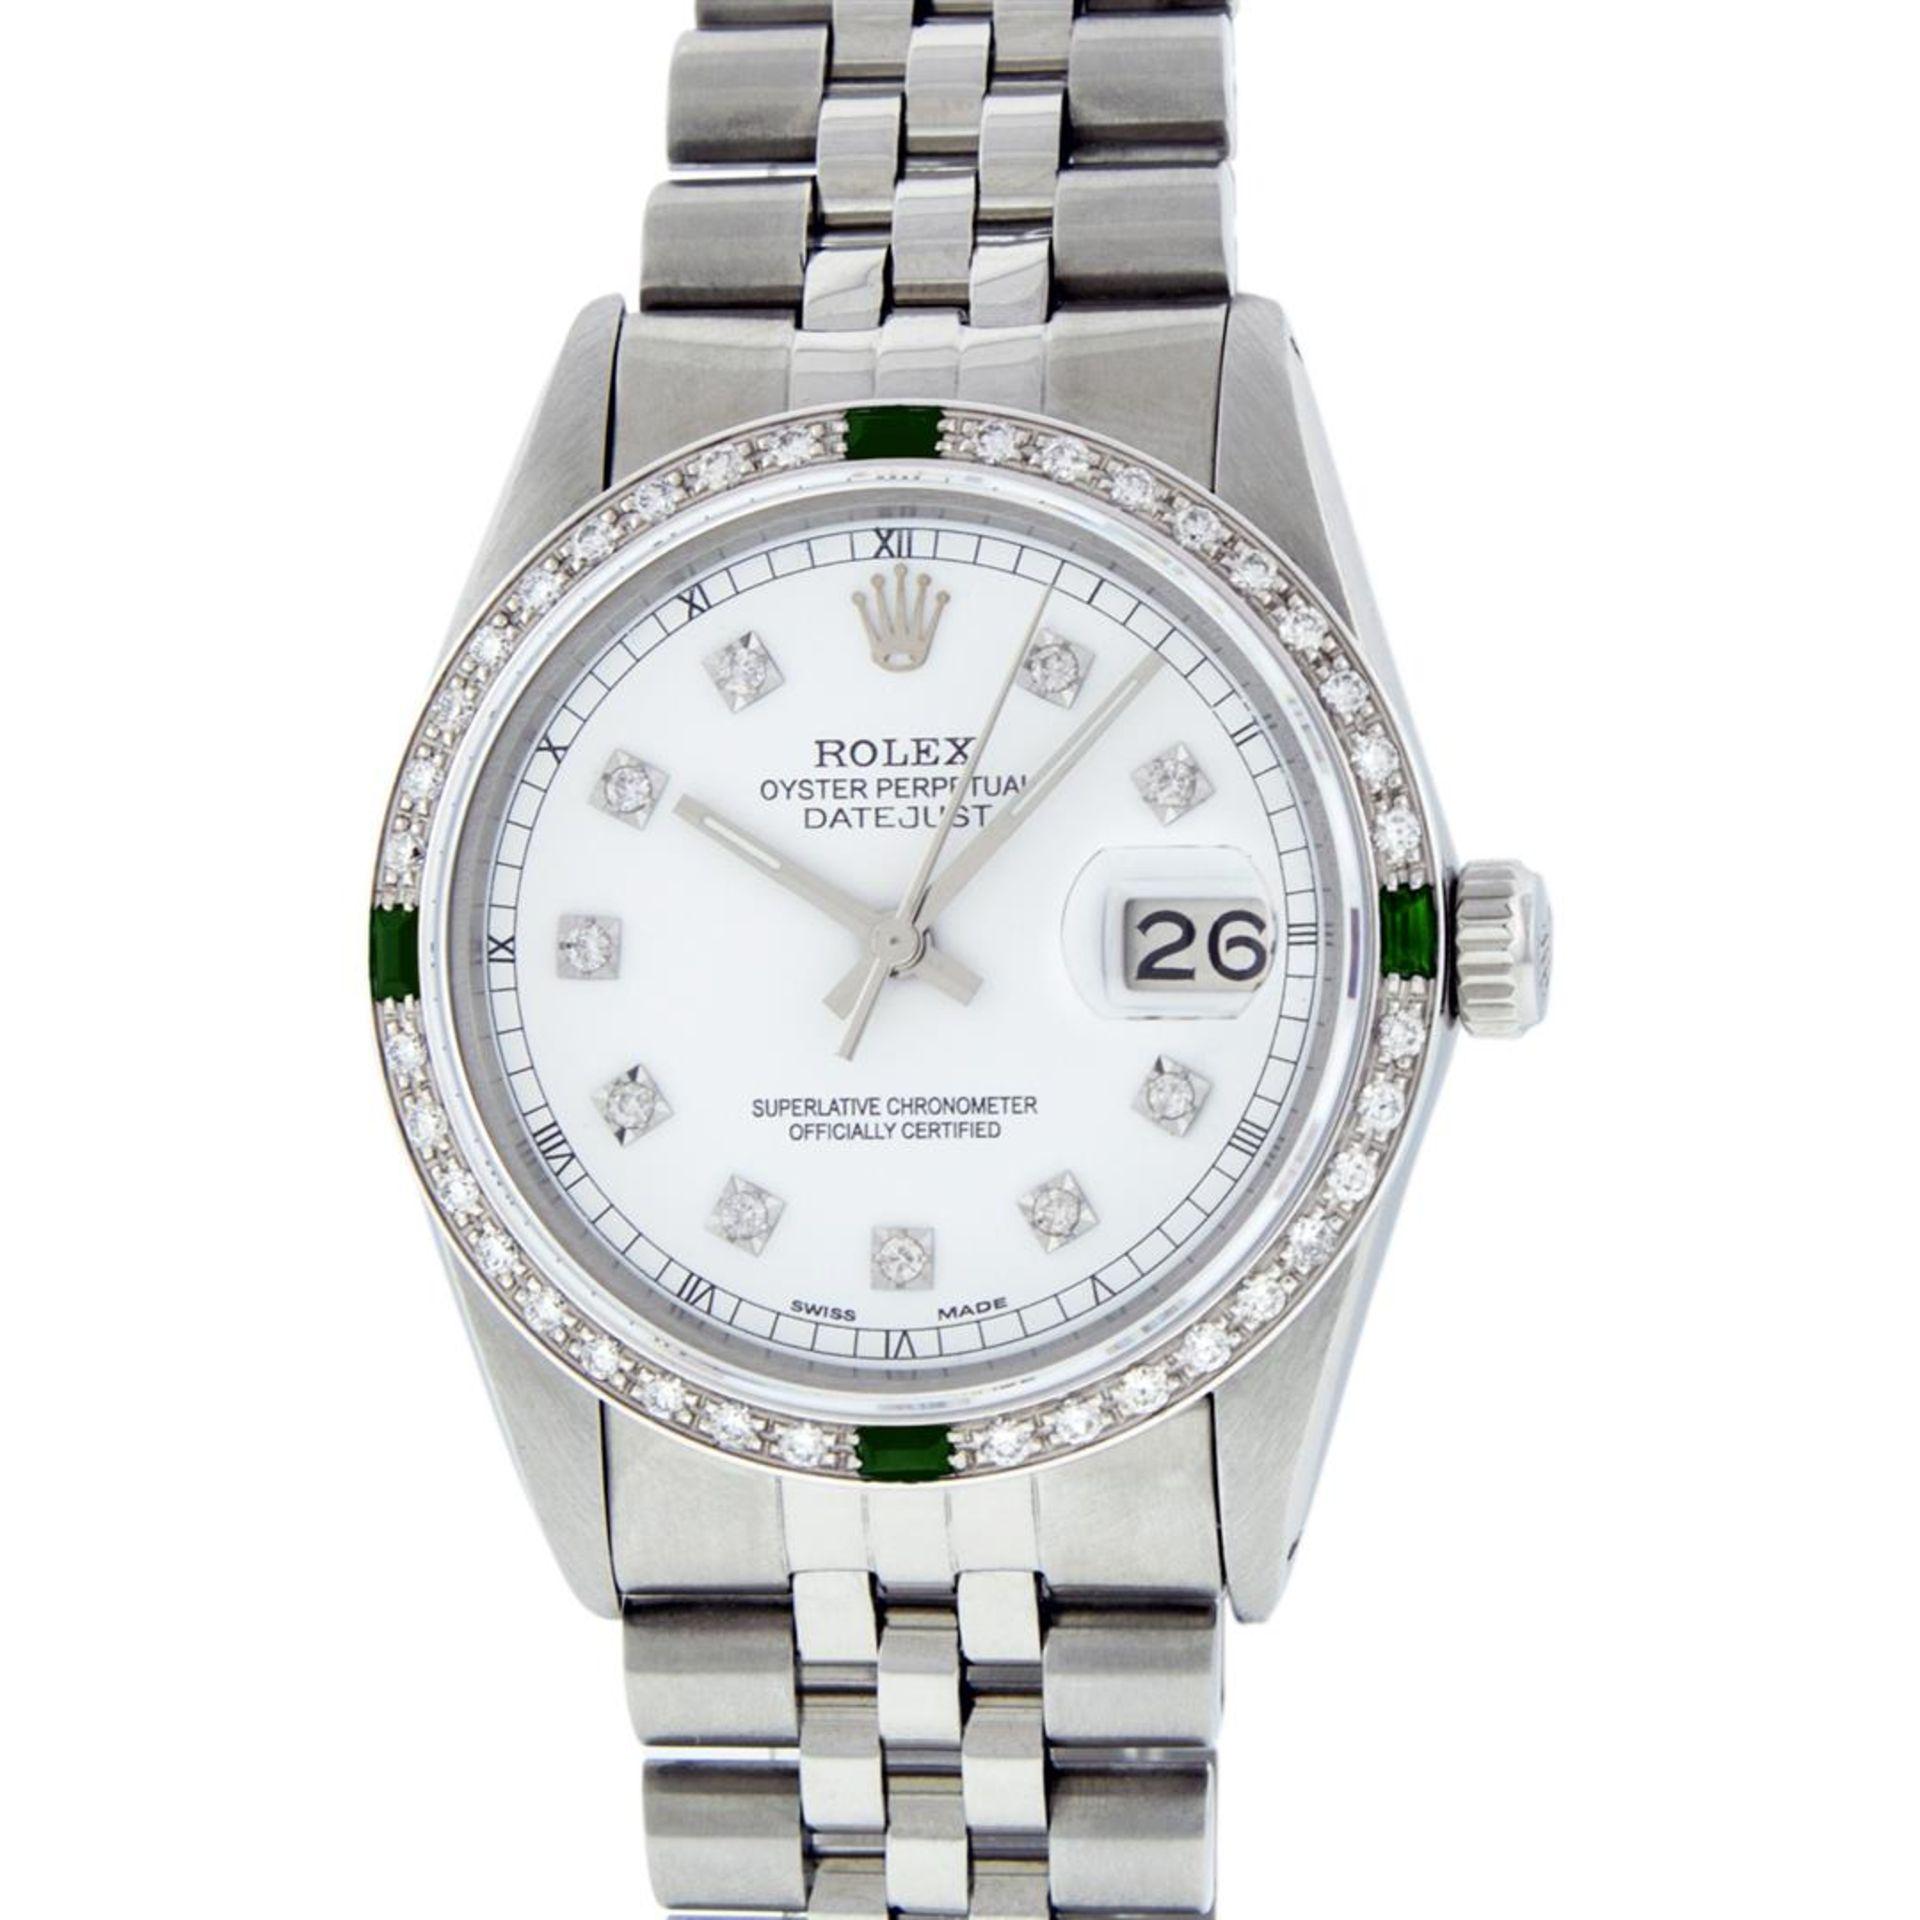 Rolex Mens Stainless Steel White Diamond & Emerald 36MM Datejust Wristwatch - Image 2 of 9